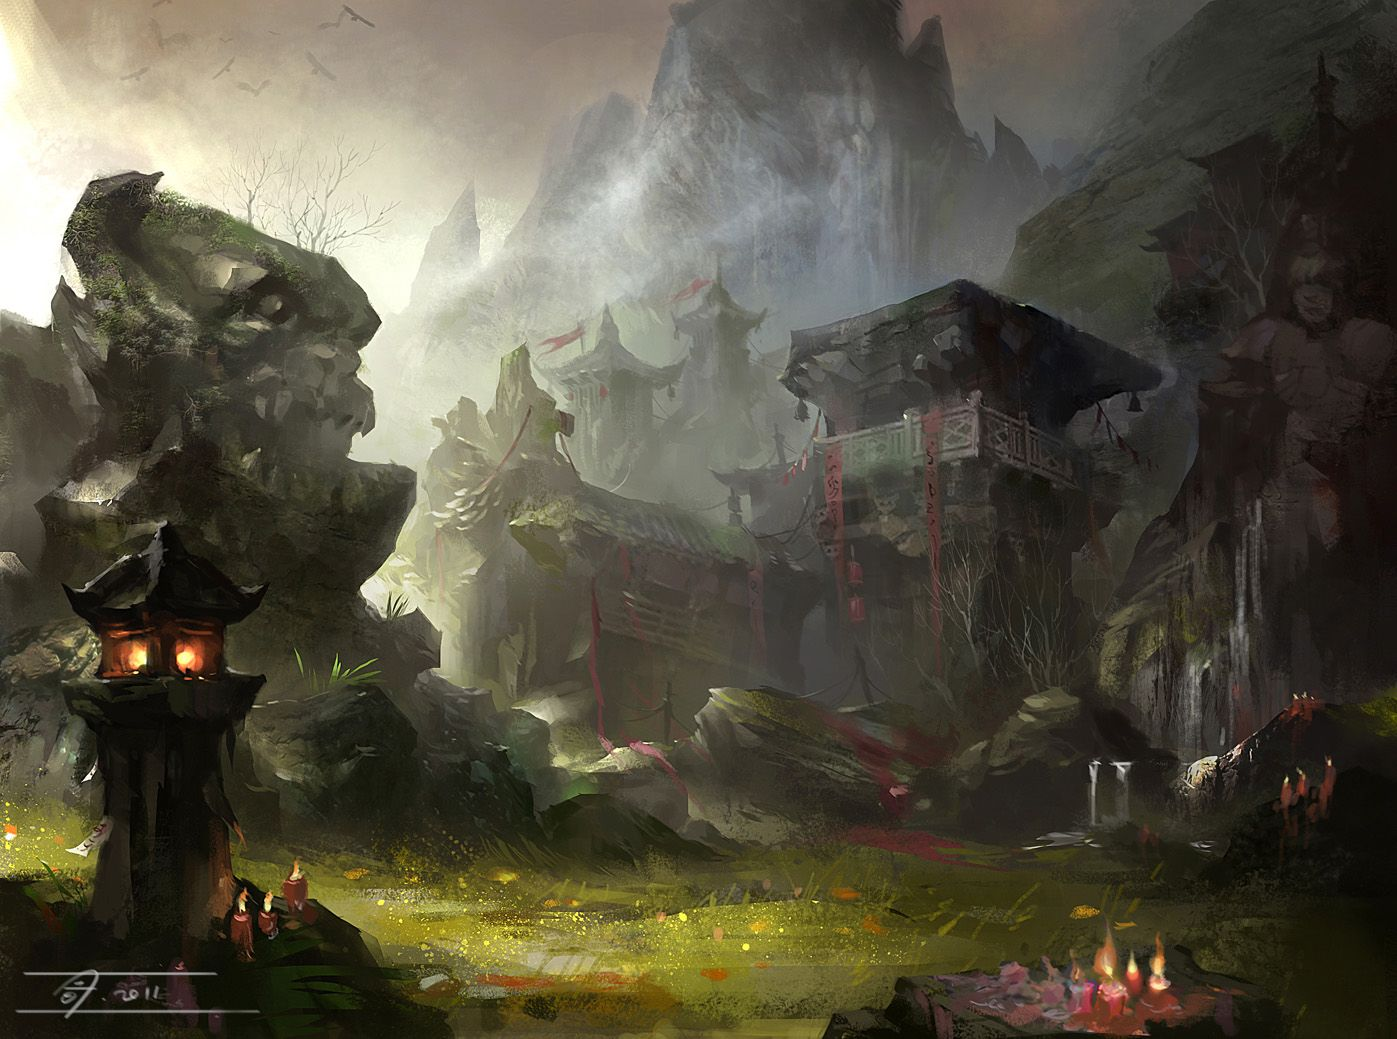 Disney Art Backgrounds Google Search Pixar Concept Art Disney Concept Art Environment Concept Art